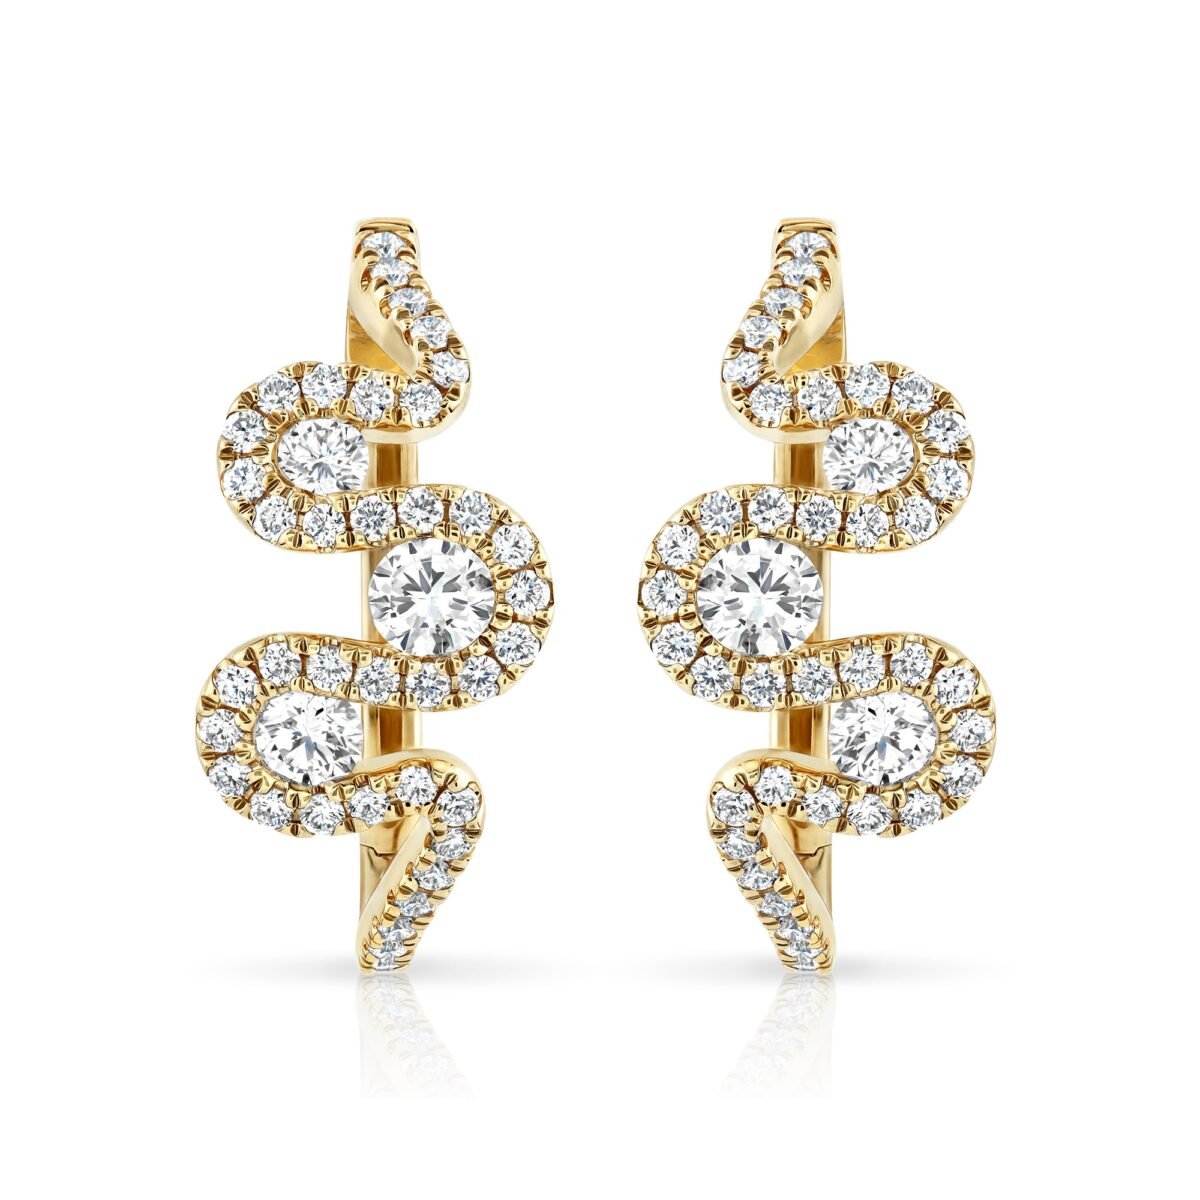 Meander Yellow Gold Diamond Earrings